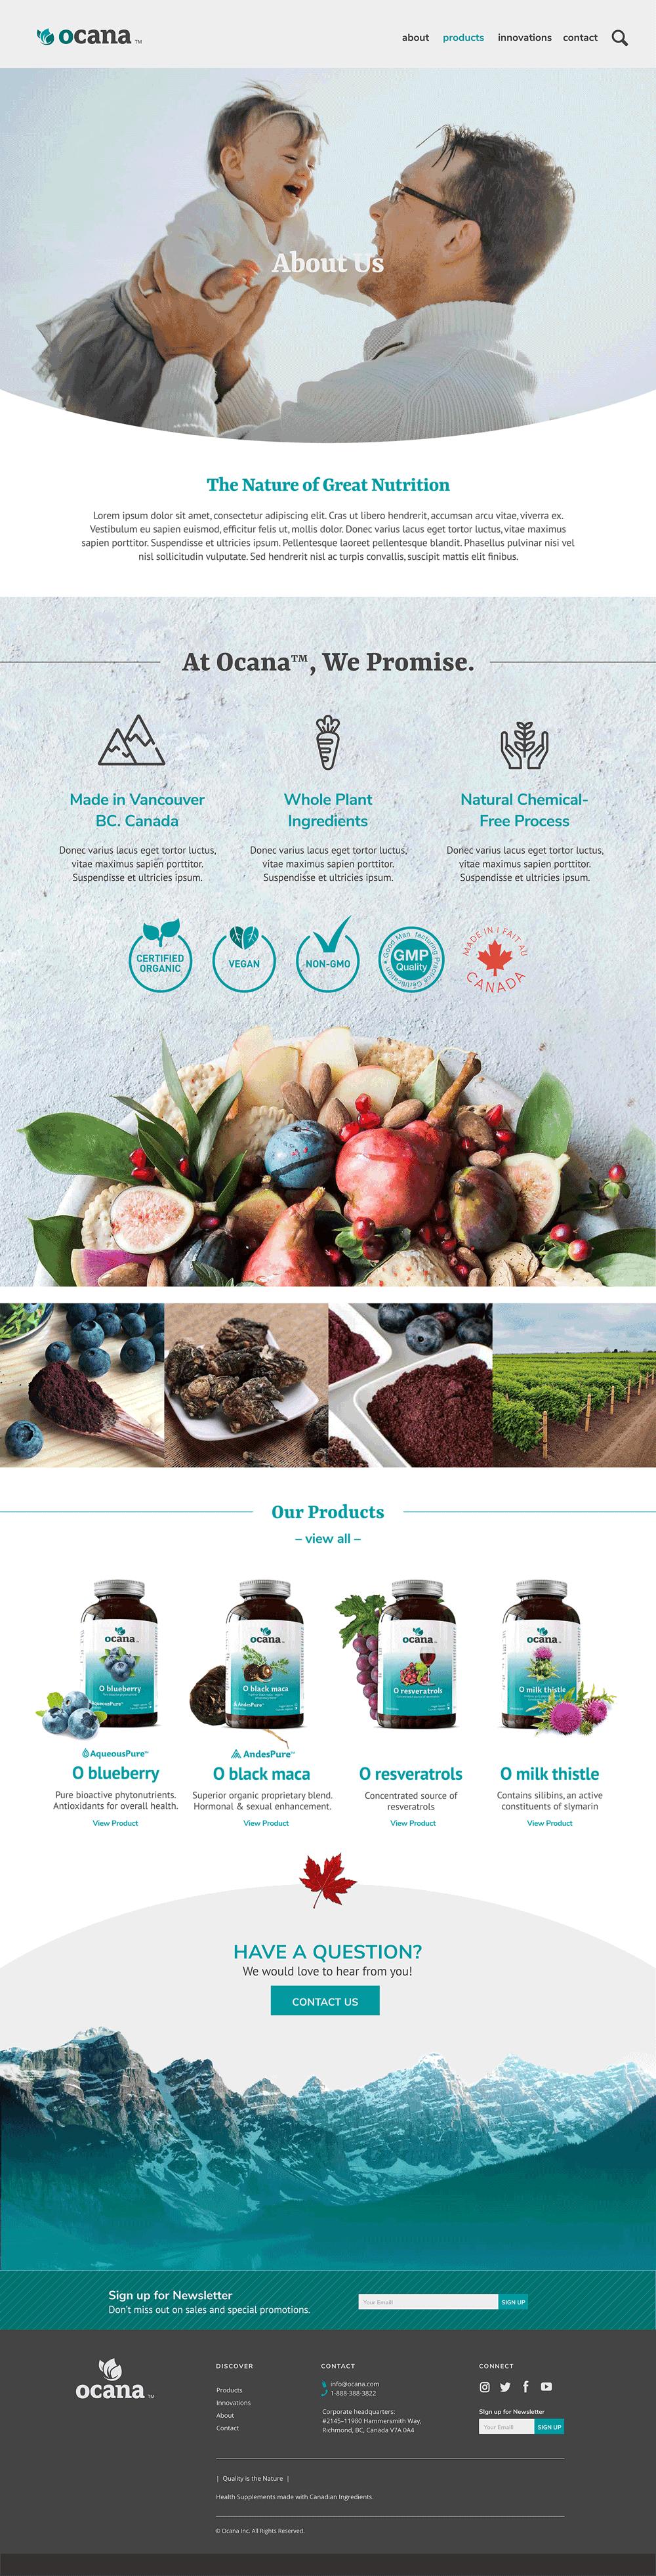 Ocana - Website Photography